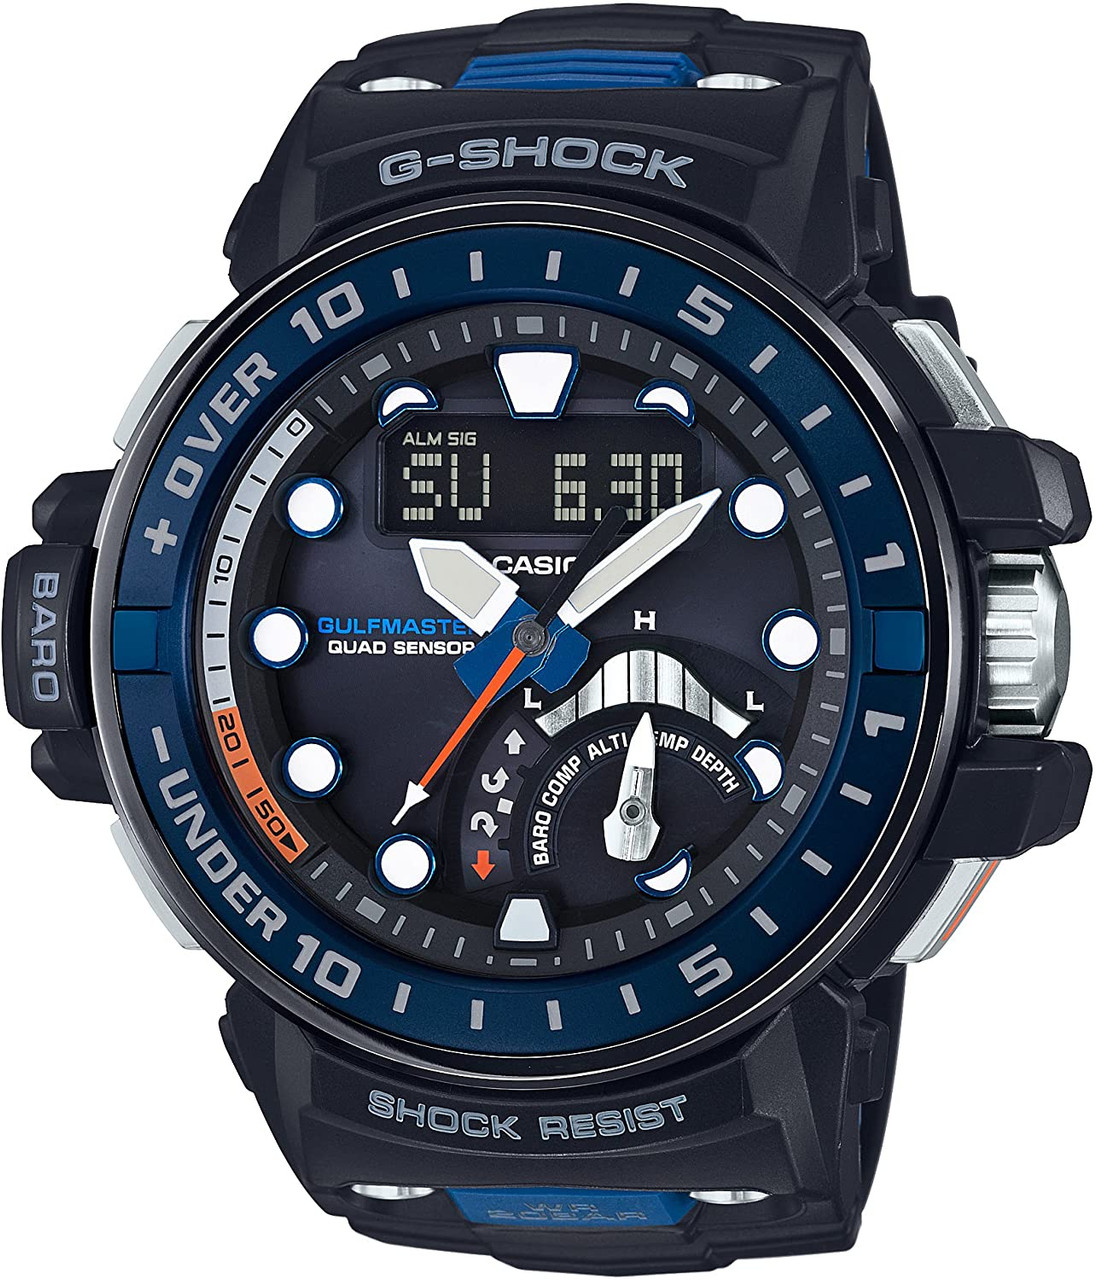 G-Shock GWN-Q1000 Gulfmaster Quad Sensors